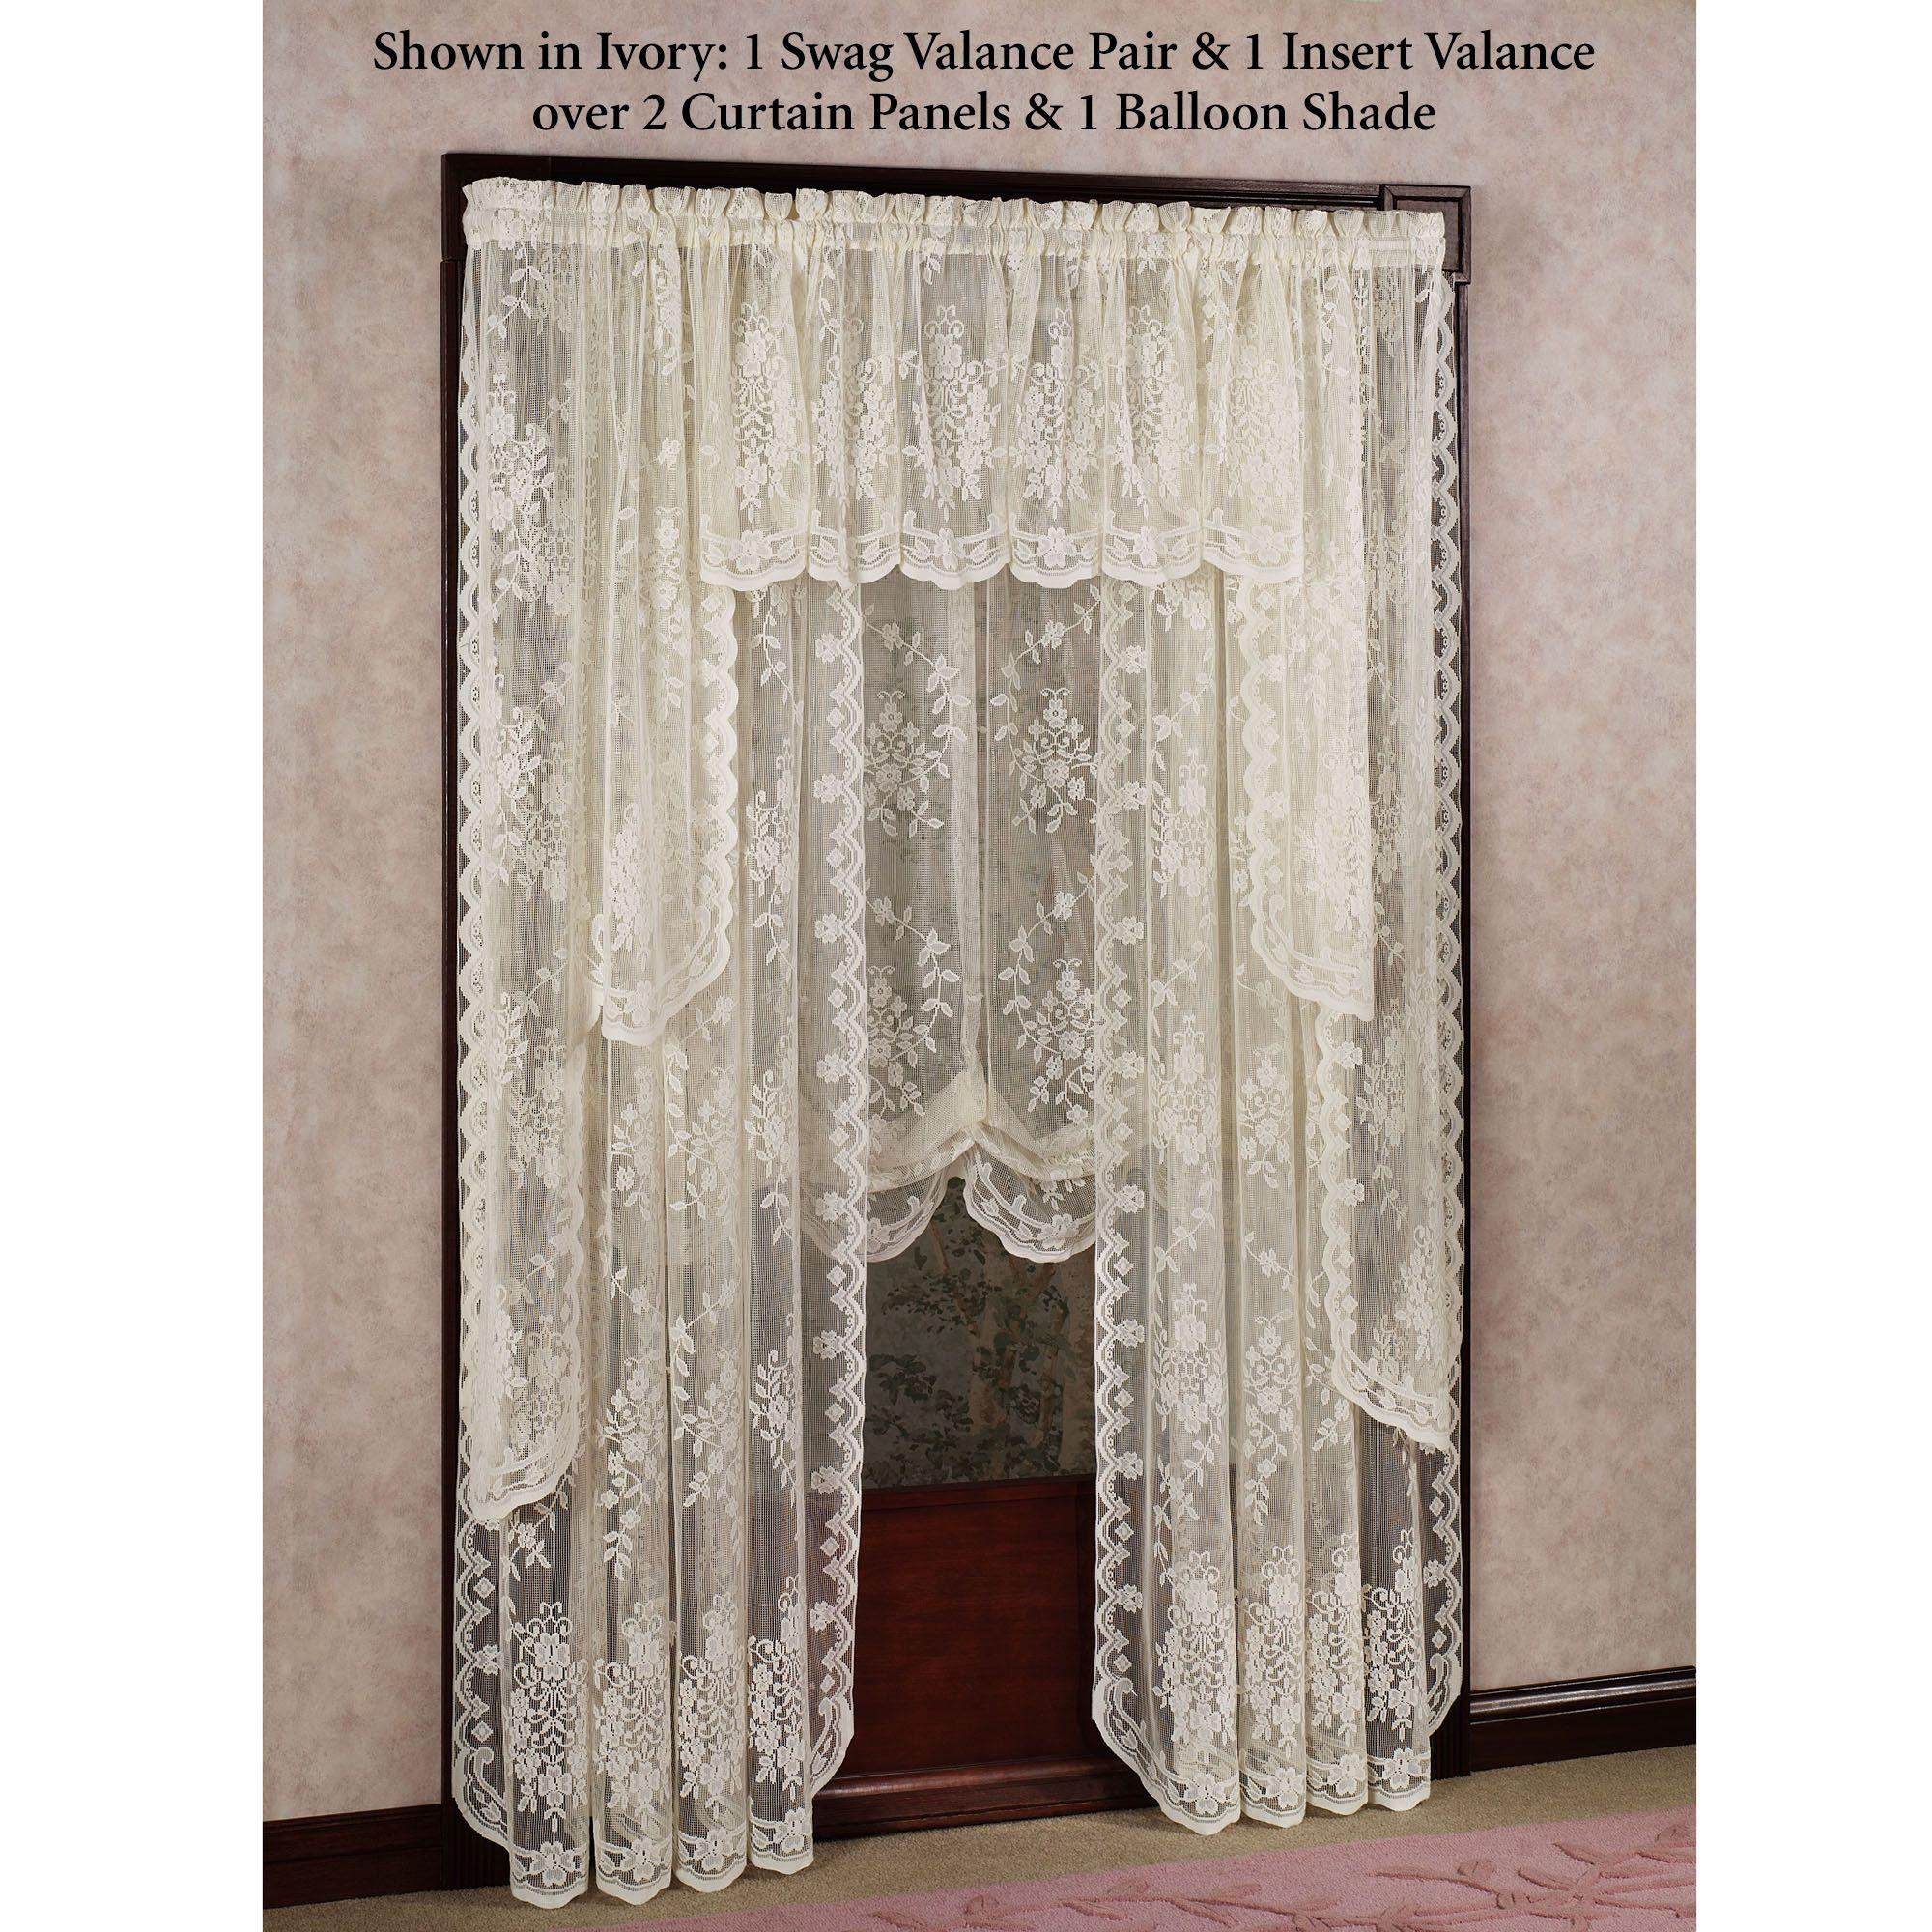 wayfair set home startling curtain sheer pinterest window basics gozoislandweather interior products treatments